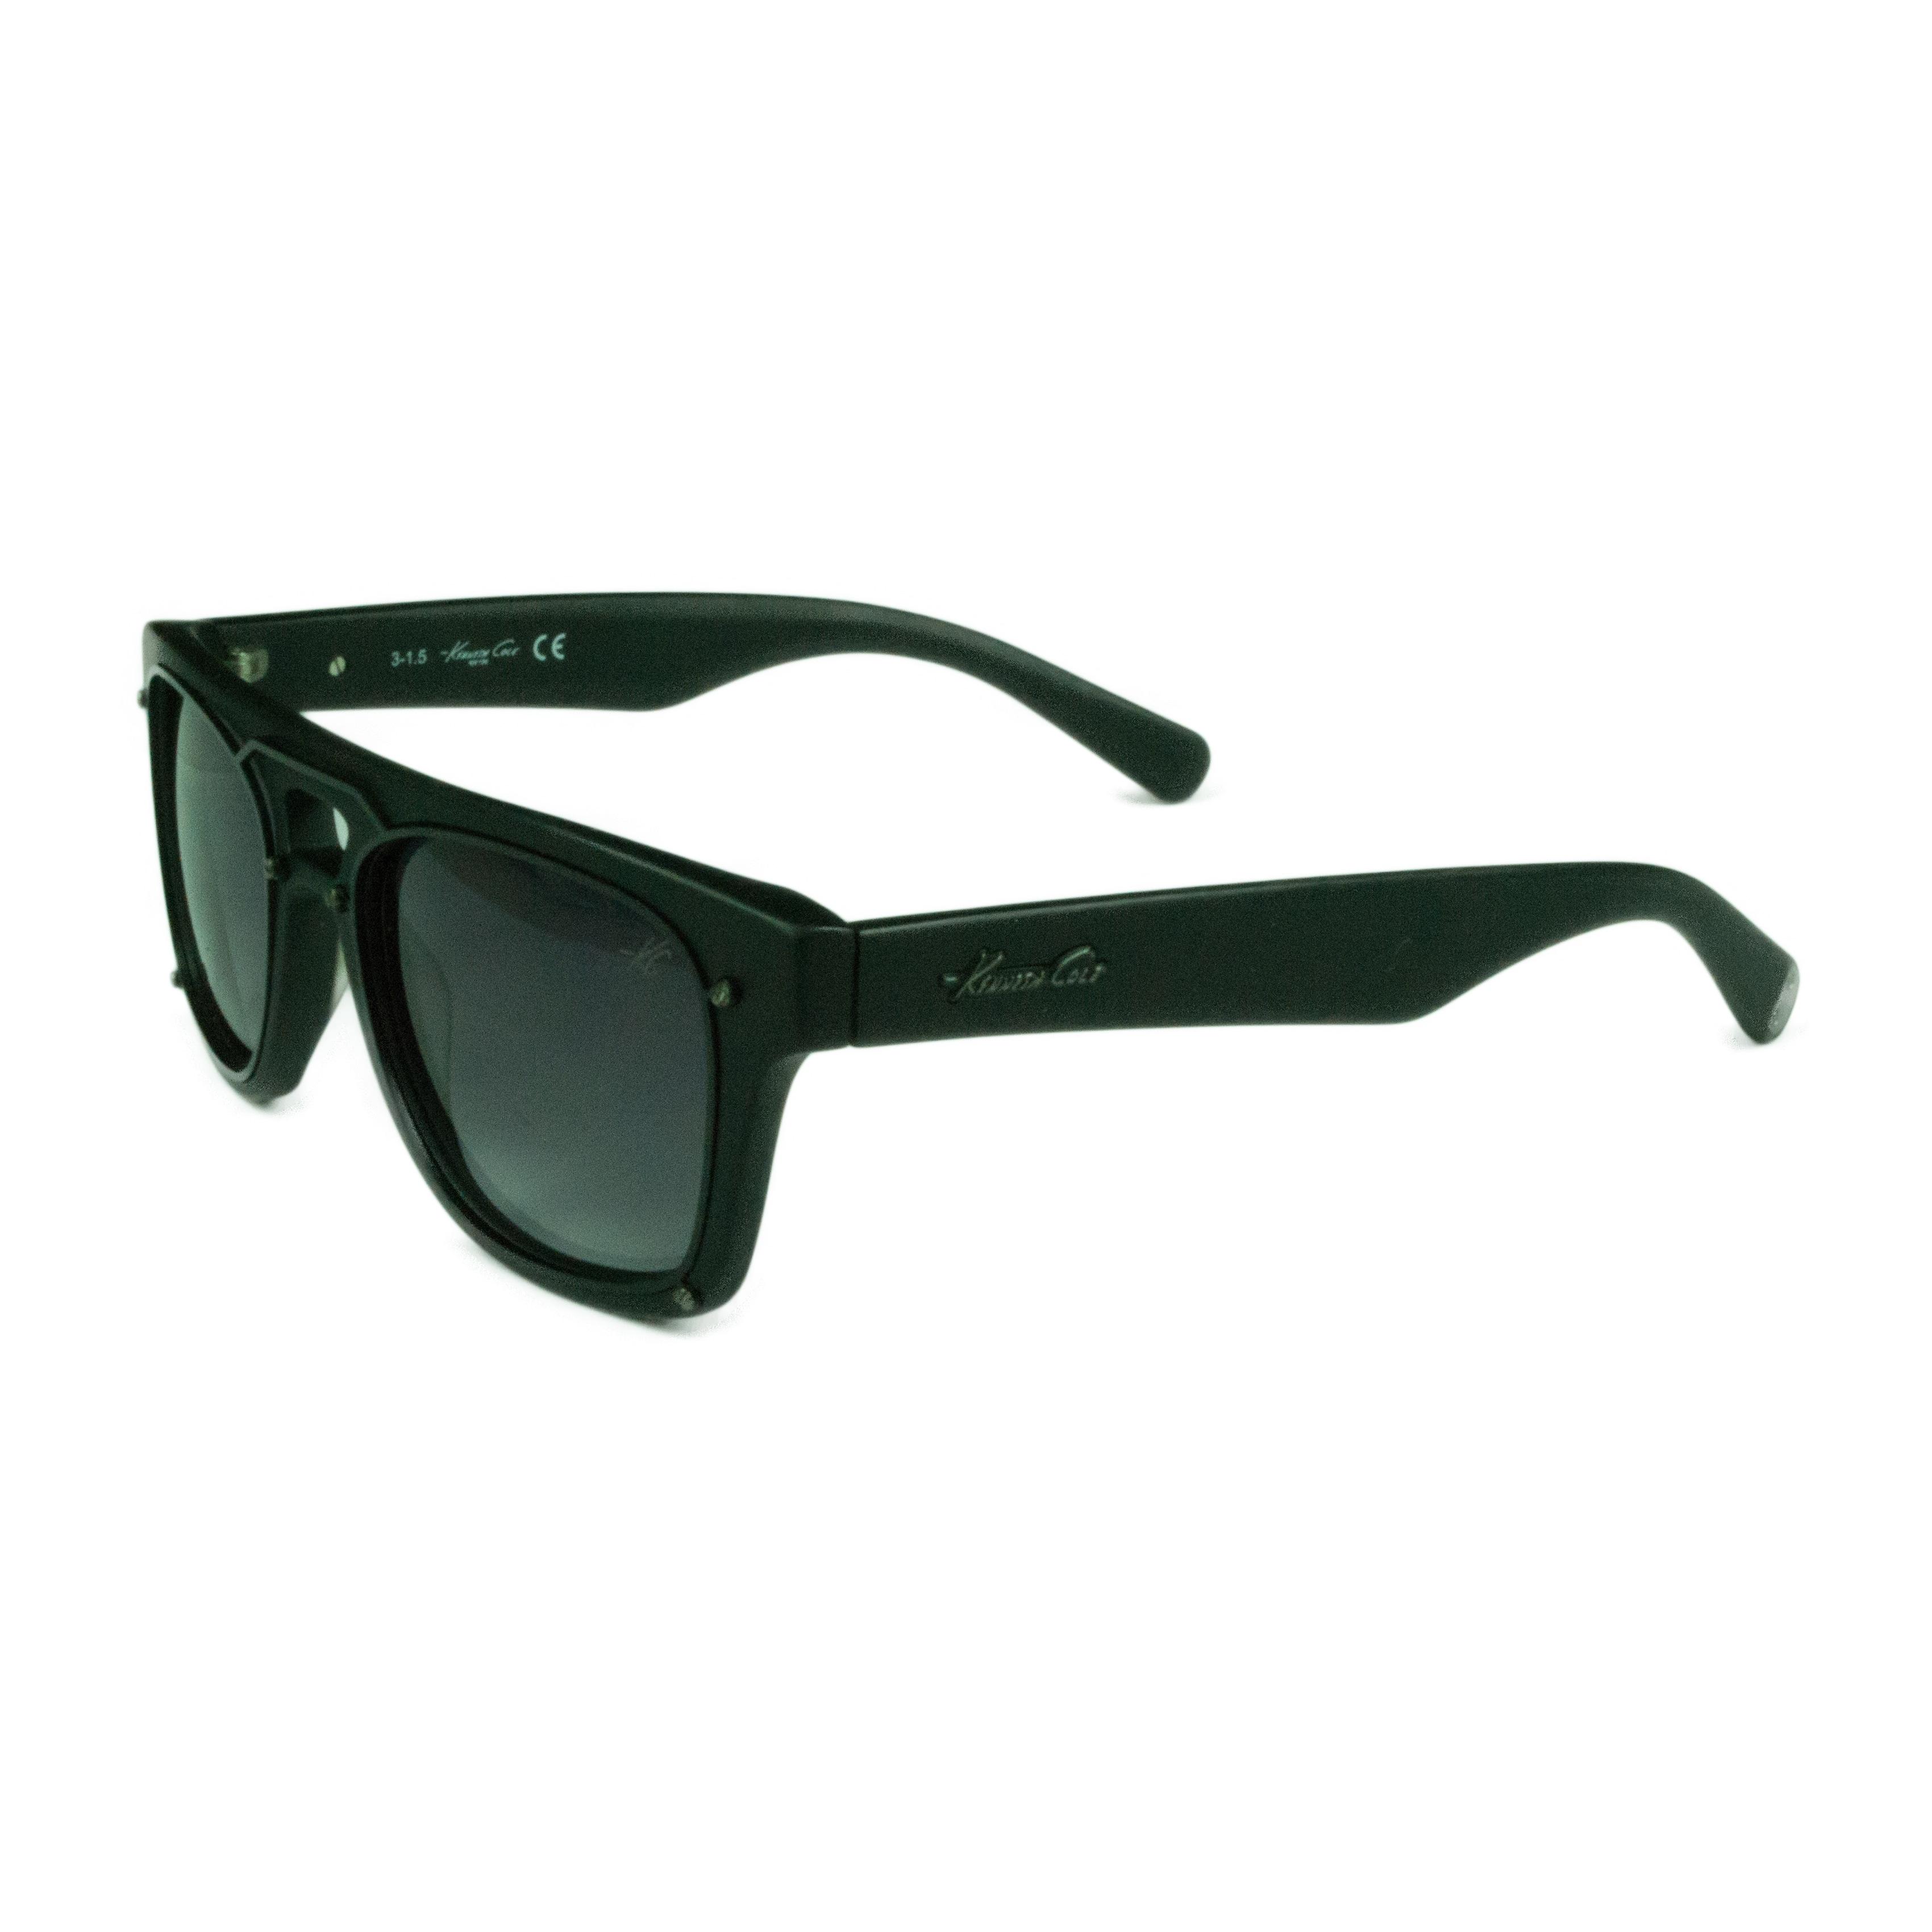 0ff443da4a Kenneth Cole Men s KC7183 02B Matte Black w  Gradient Smoke Lens Sunglasses